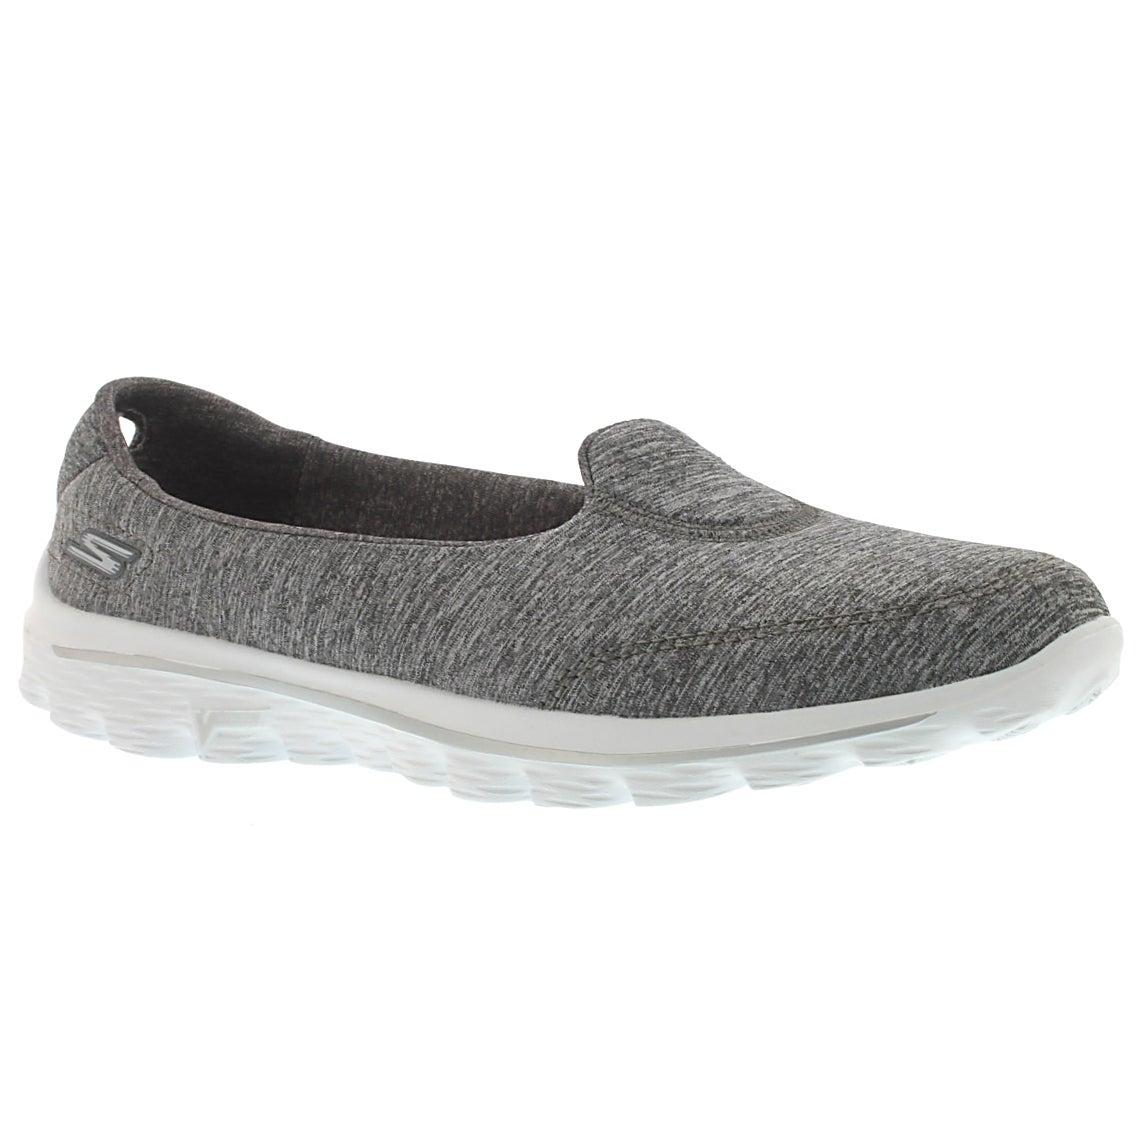 Lds GOwalk 2 Whirl grey slip on